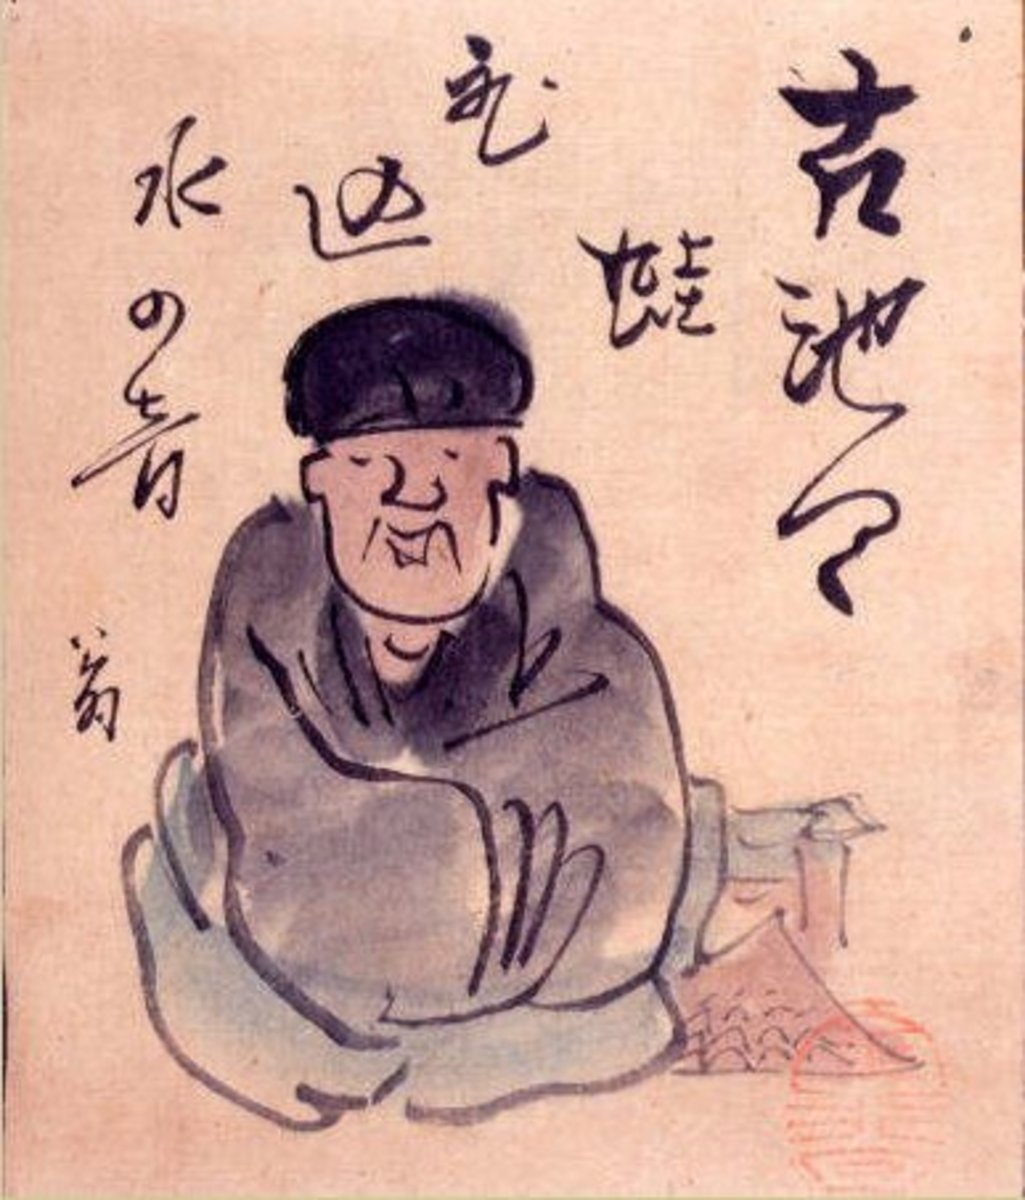 Pen and ink portrait of the Japanese Haiku master poet Basho.